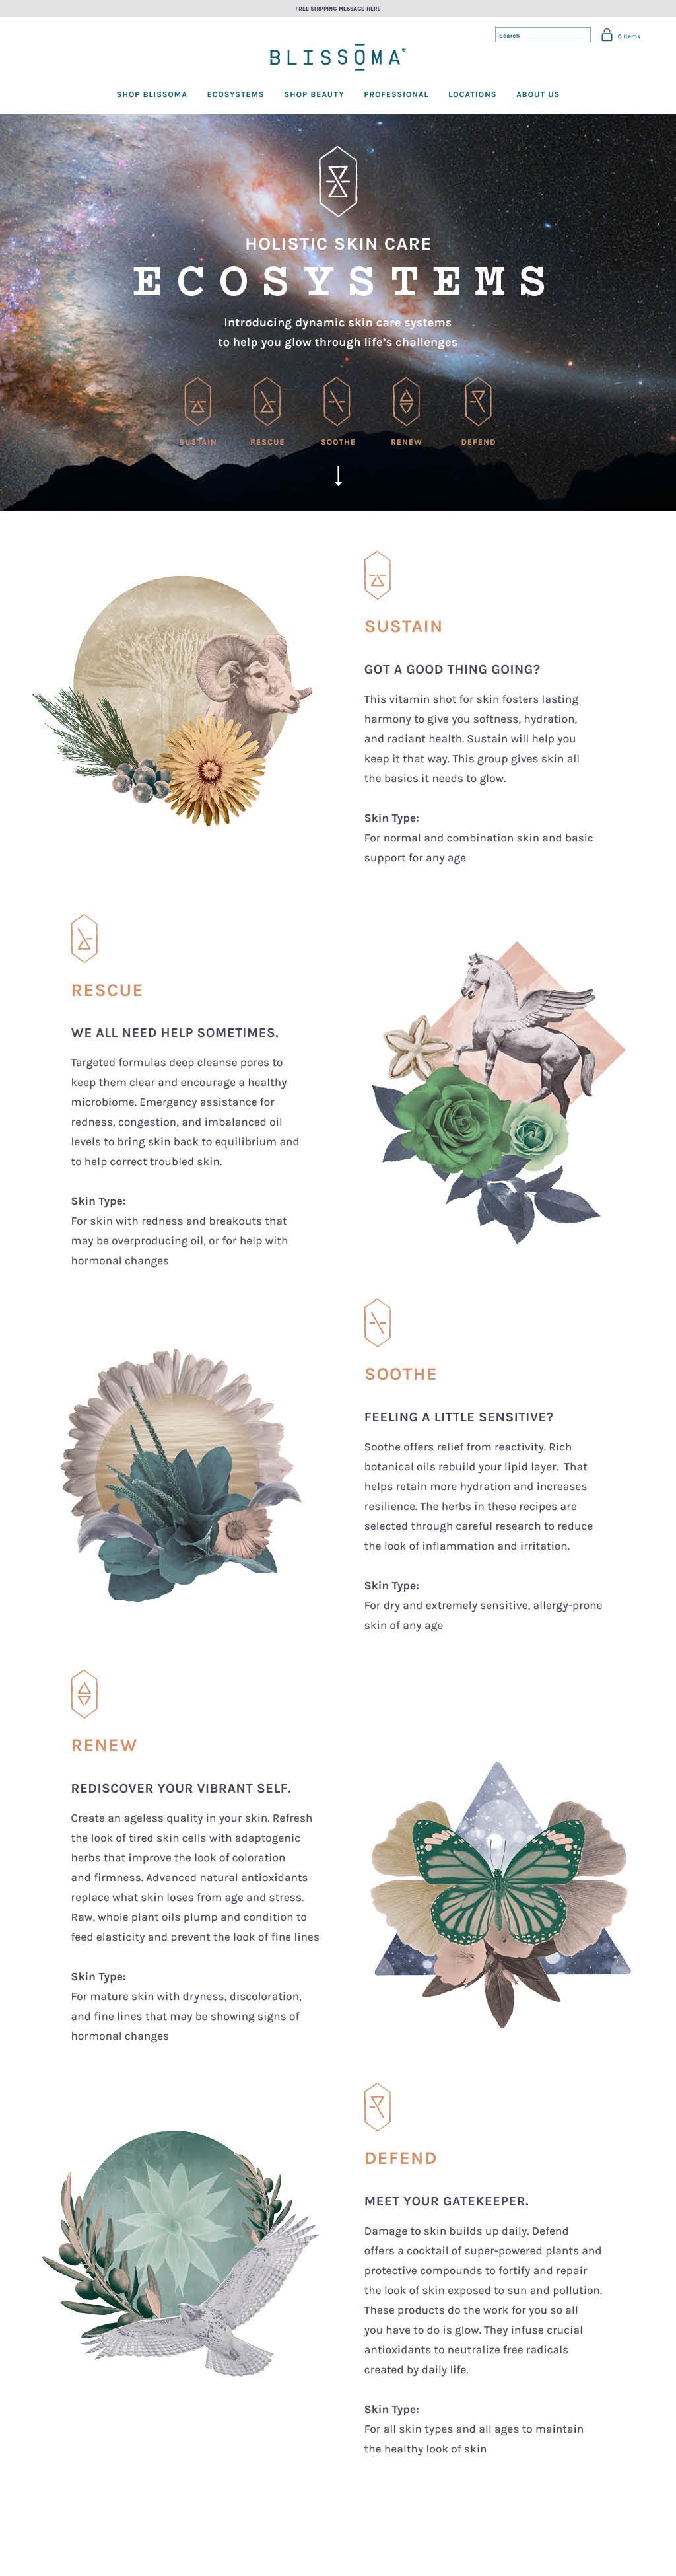 Ecosystems LP.jpg